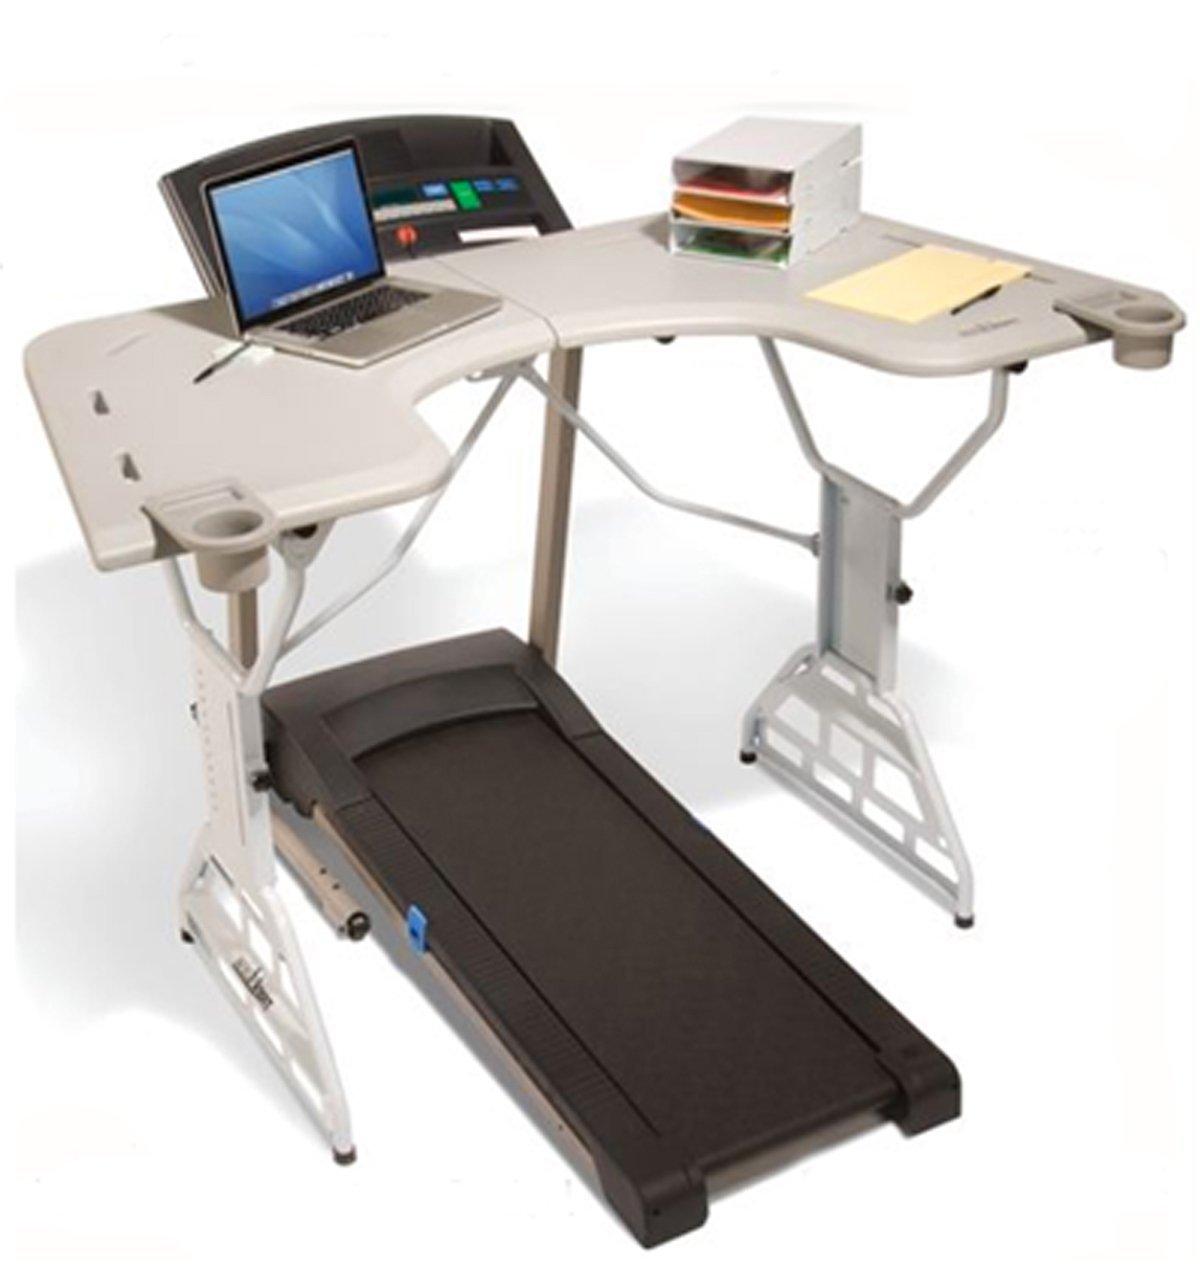 amazon.com : trekdesk treadmill desk : exercise treadmills : sports u0026  outdoors QRMOUCK